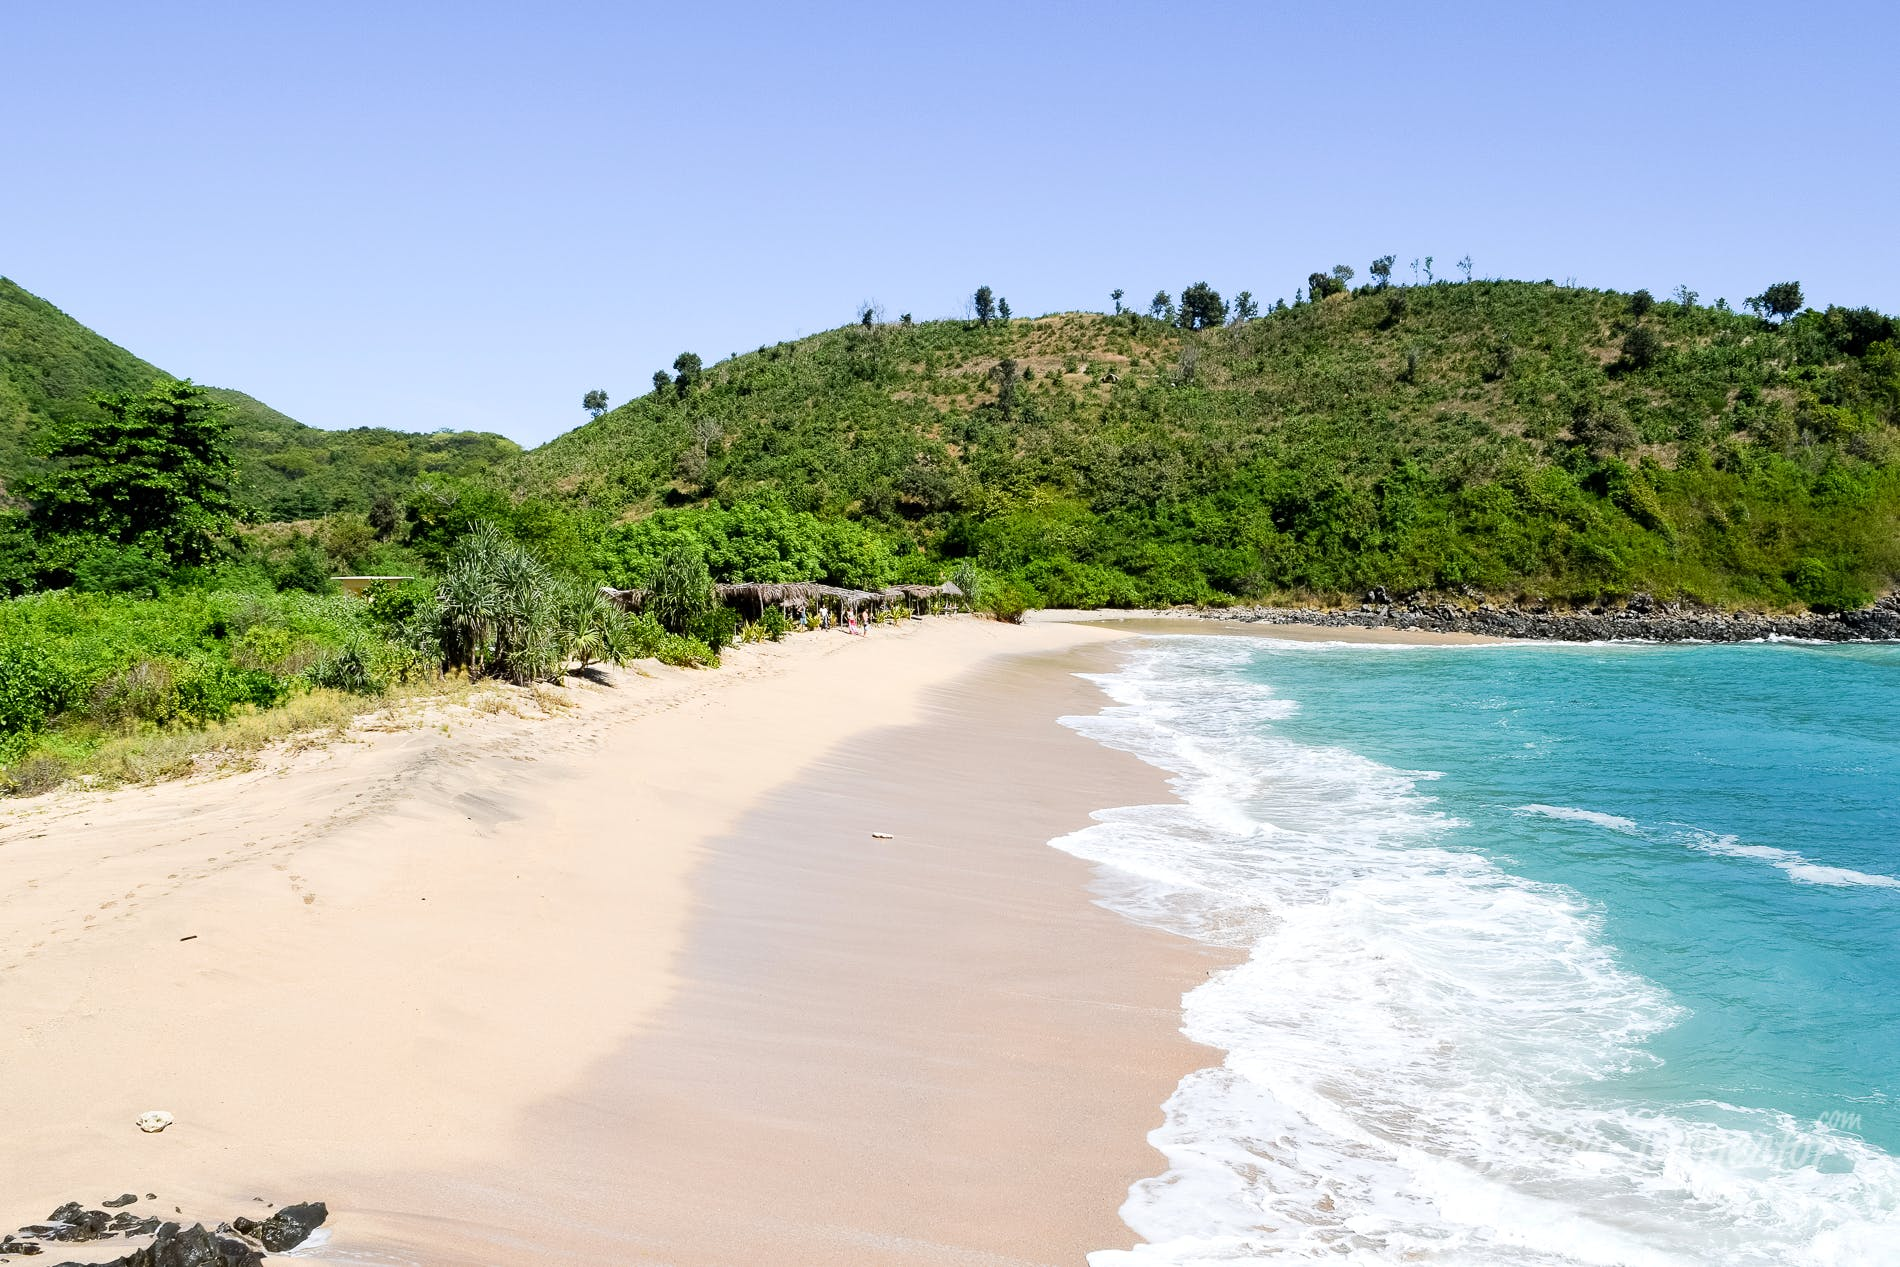 Playa Mawi Beach, Lombok, Indonesia